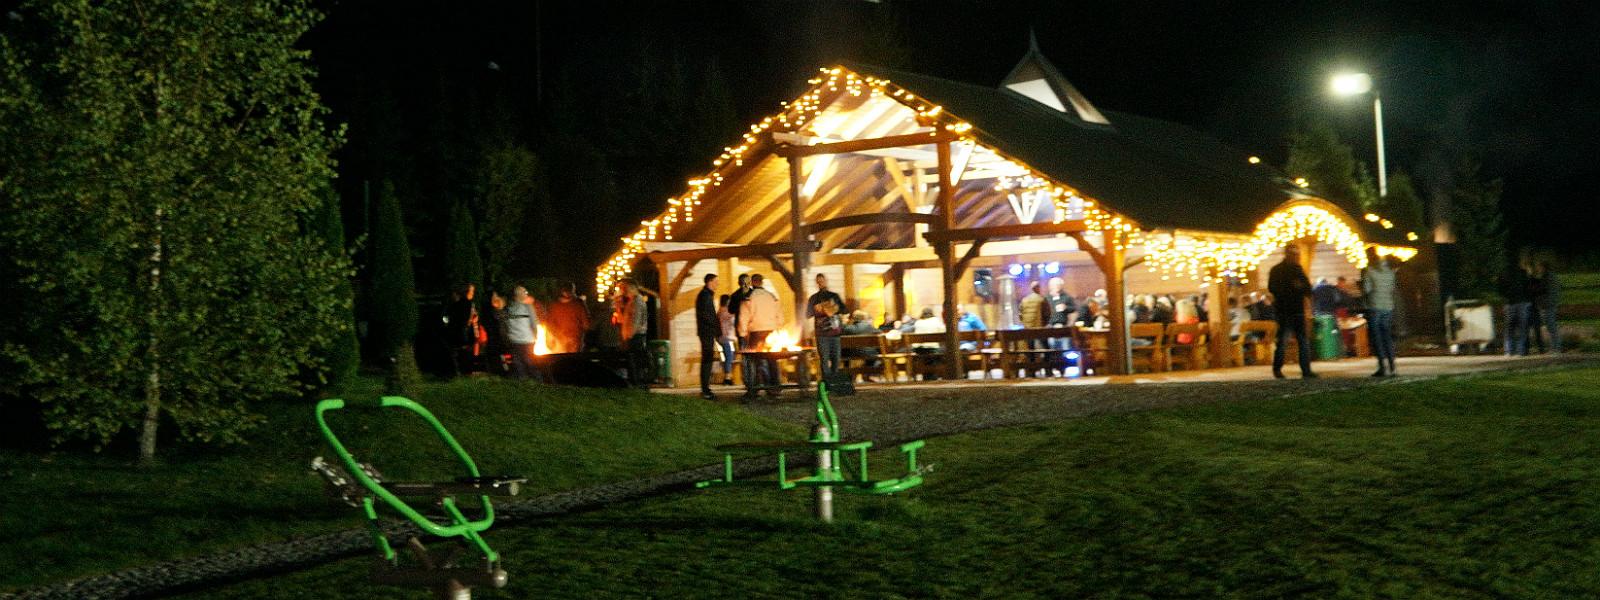 impreza integracyjna w Hotelu Activa - wiata grillowa